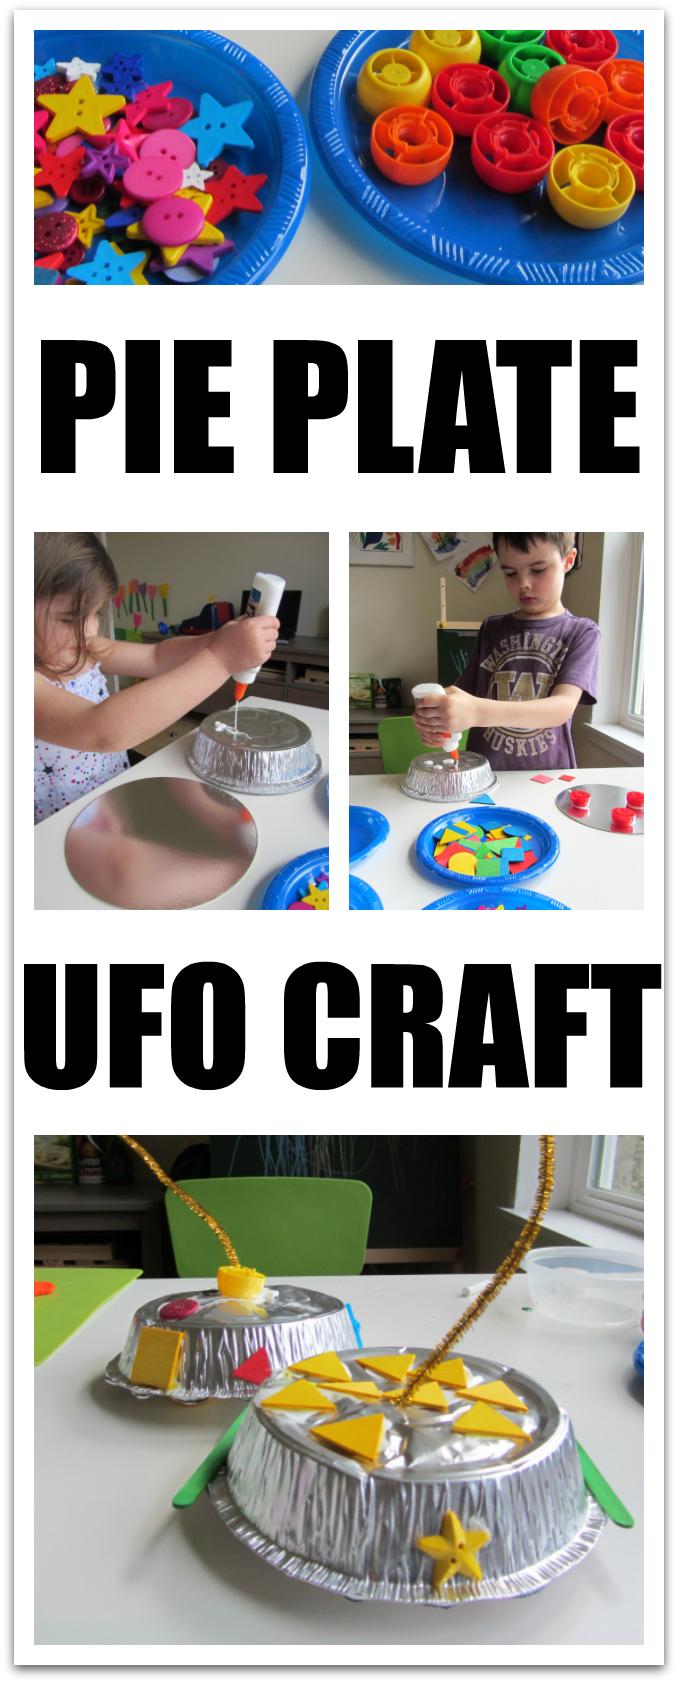 Space theme at preschool